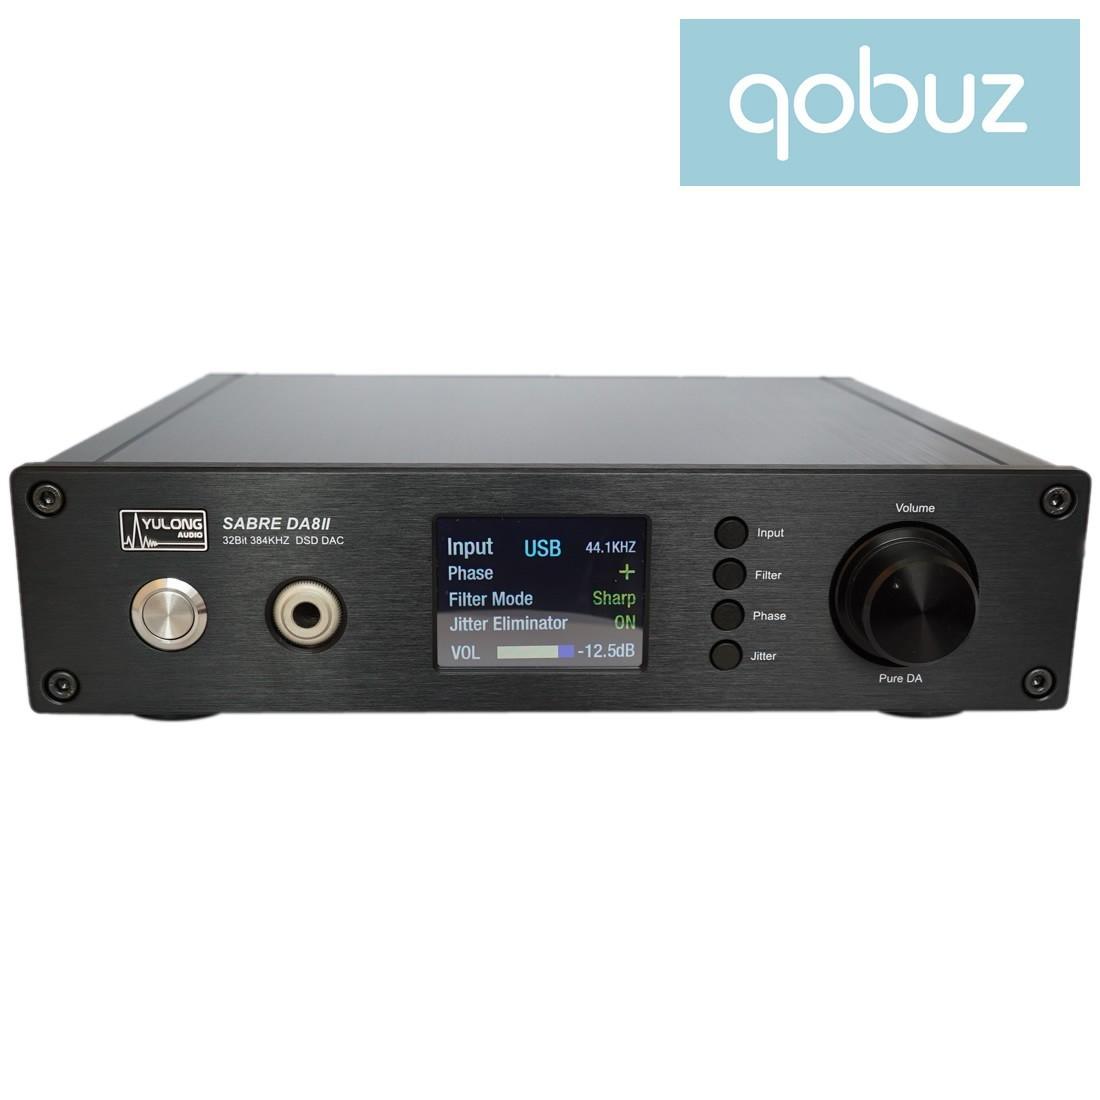 Yulong Audio SABER DA8 II 2 DSD DAC 32bit / 384kHz Class A Black